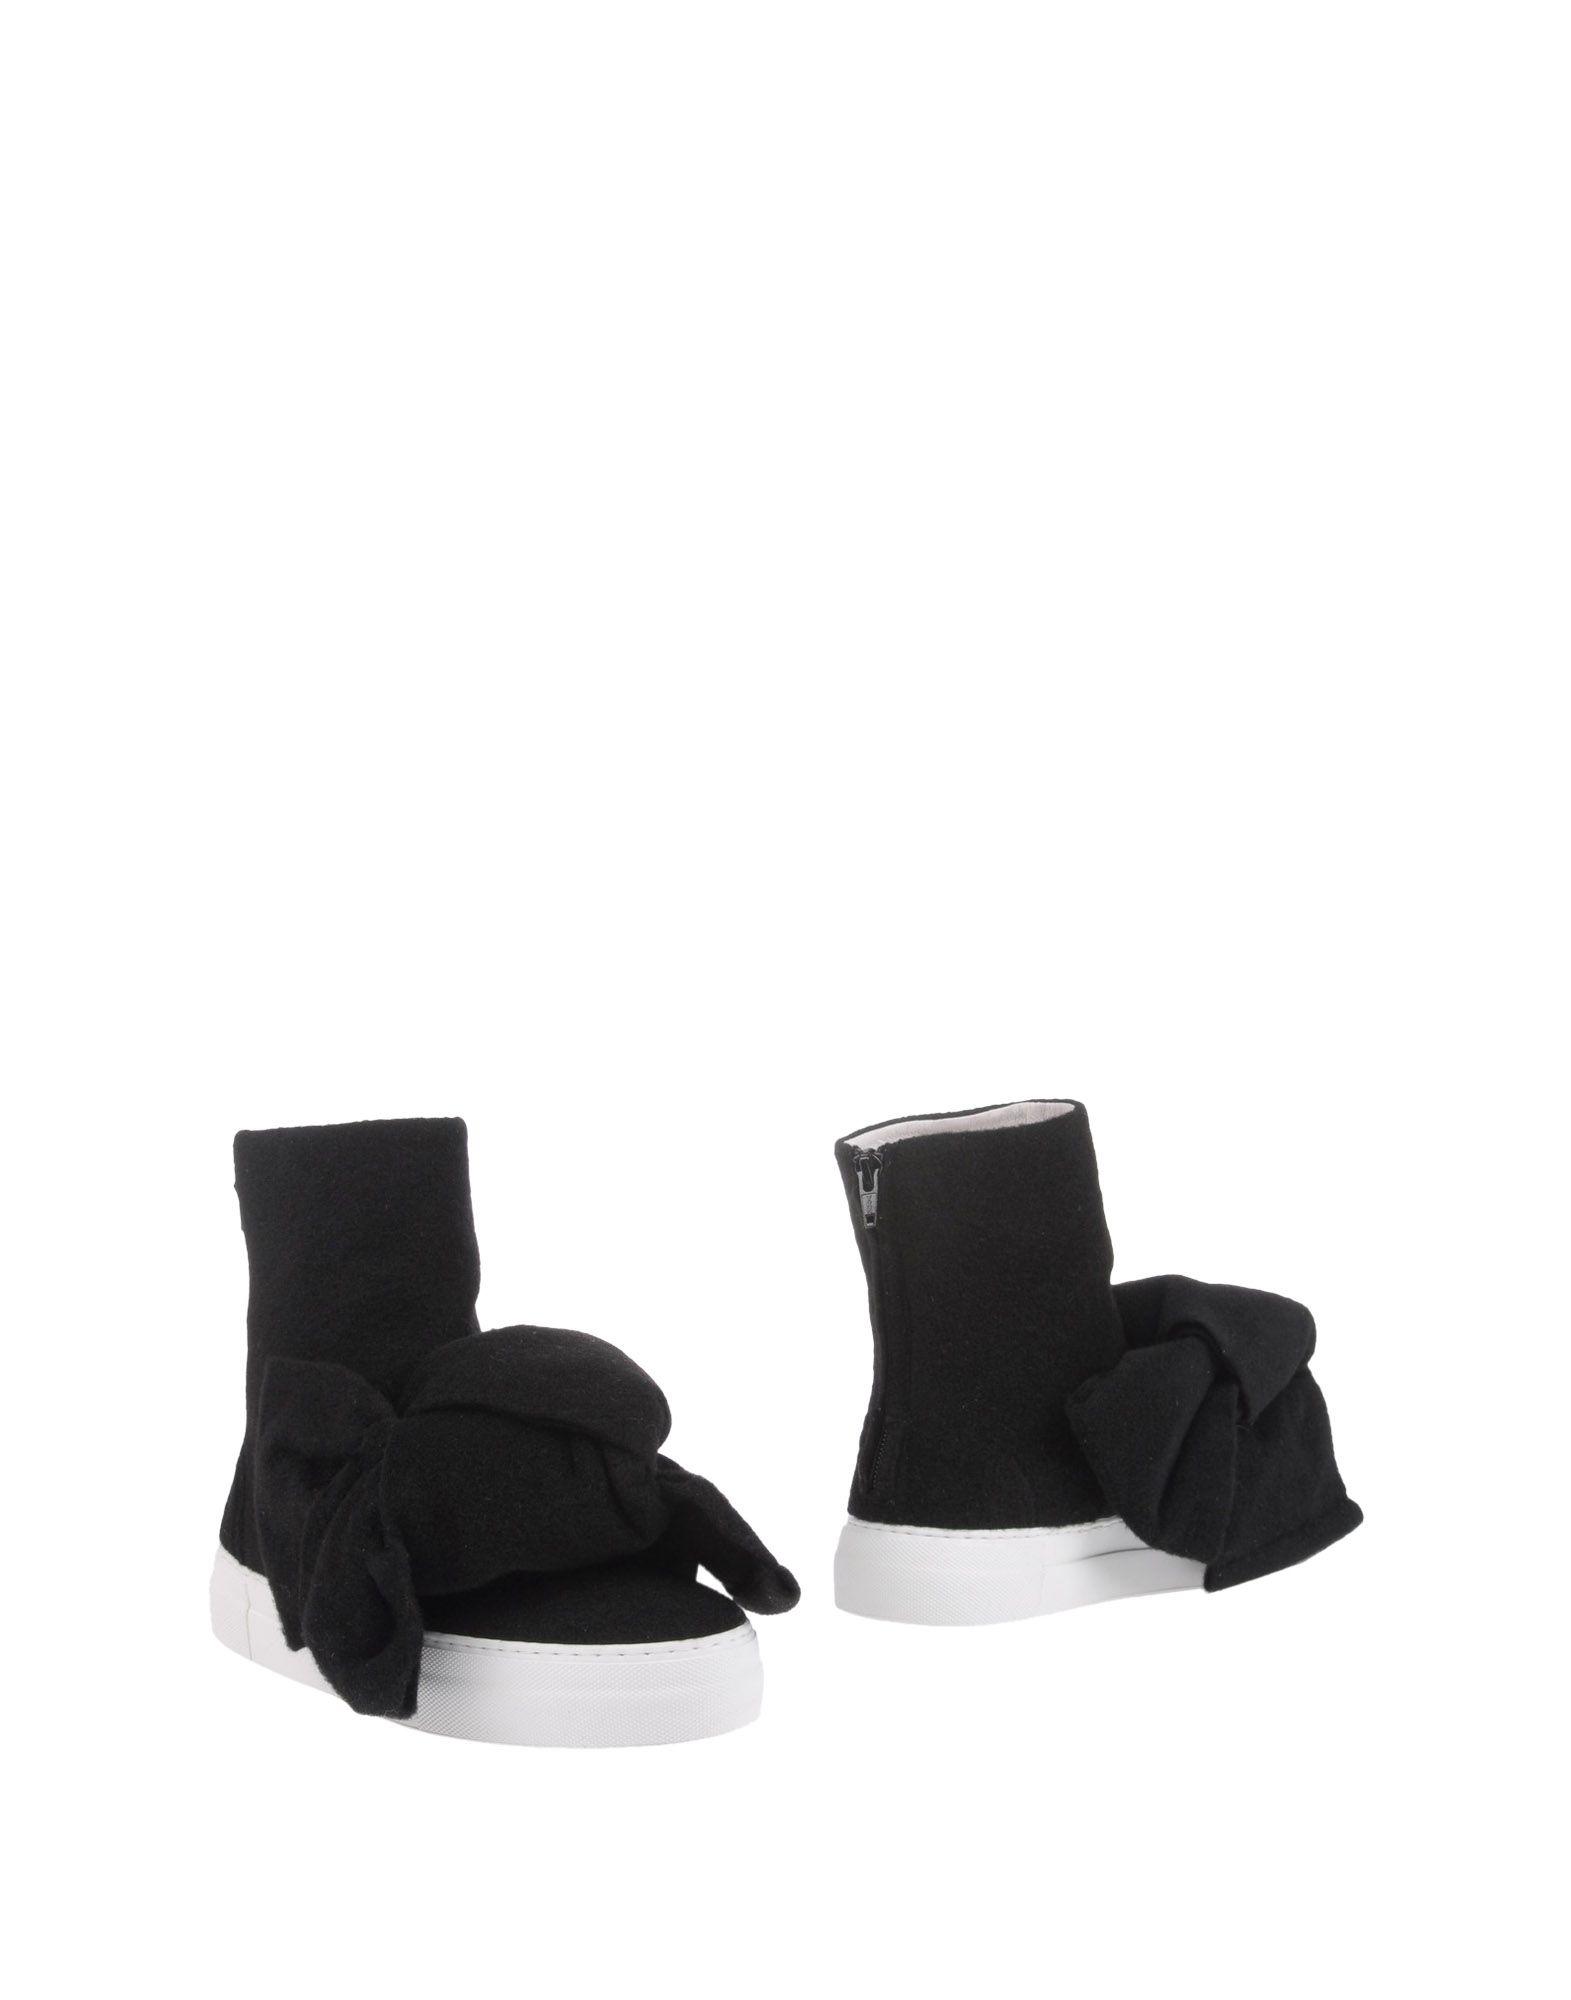 Haltbare Mode billige Schuhe Joshua*S Stiefelette Damen  11211965EA Heiße Schuhe